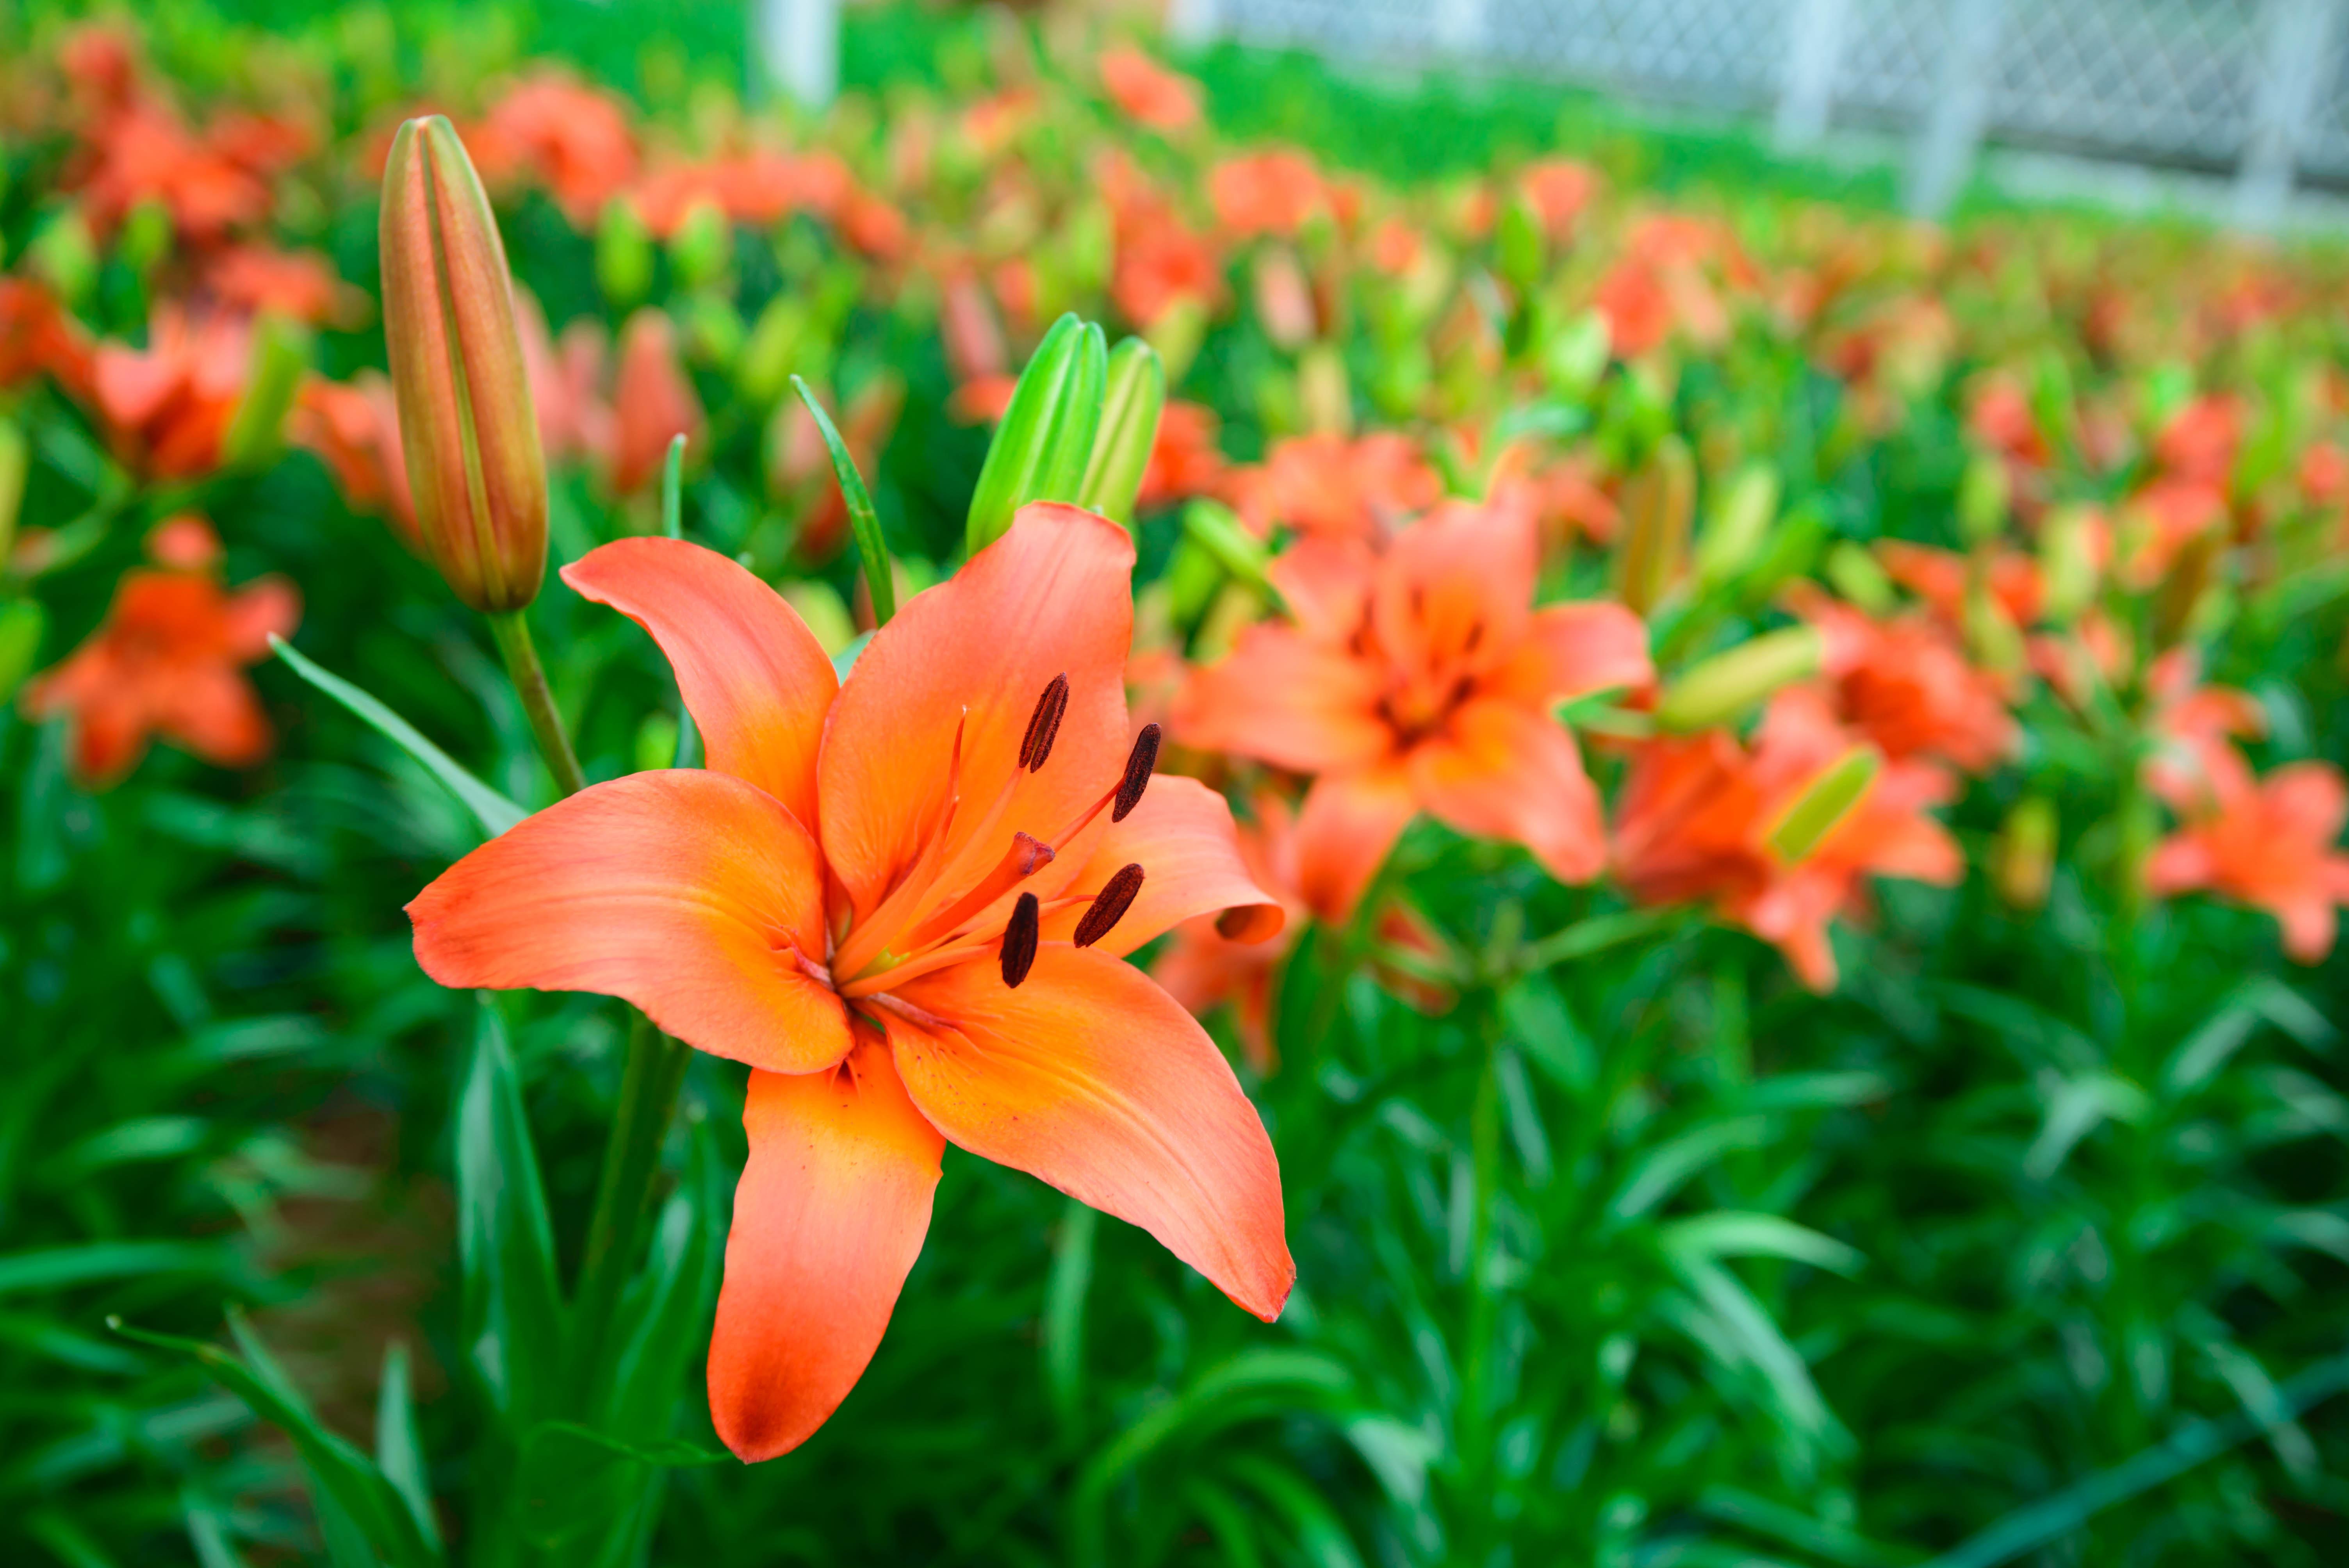 Free Images Beautiful Flower Flower Buds Nature Flower Garden